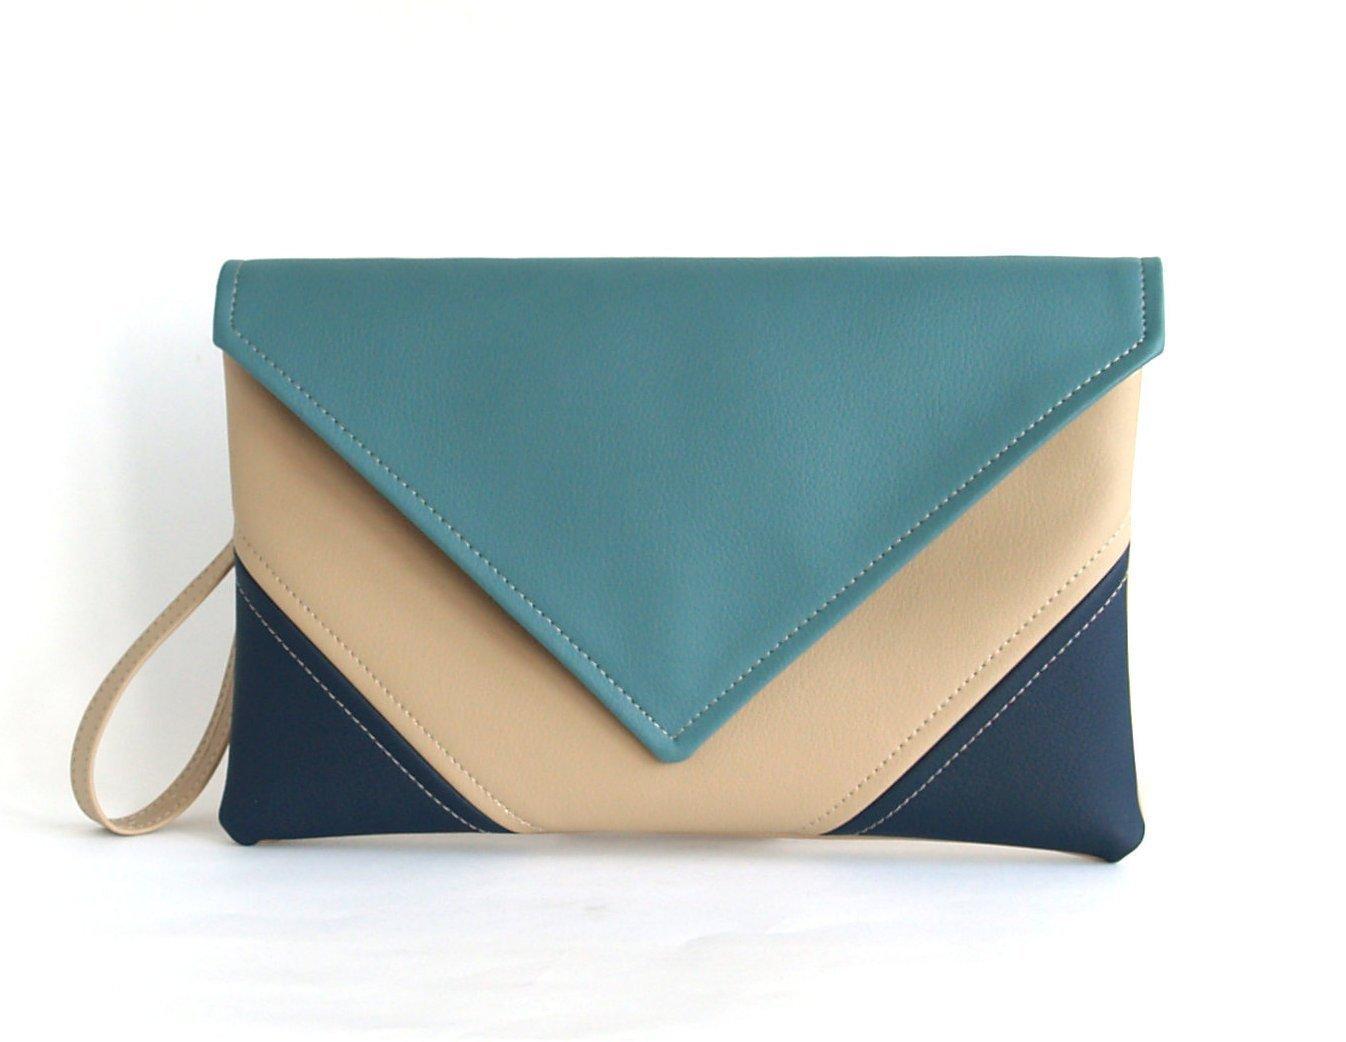 Clutch Bag envelope Hanmade Blue Navy Beige Purse Vegan Eco Faux leather Handbag Strap Evening Bag wedding bridesmaid